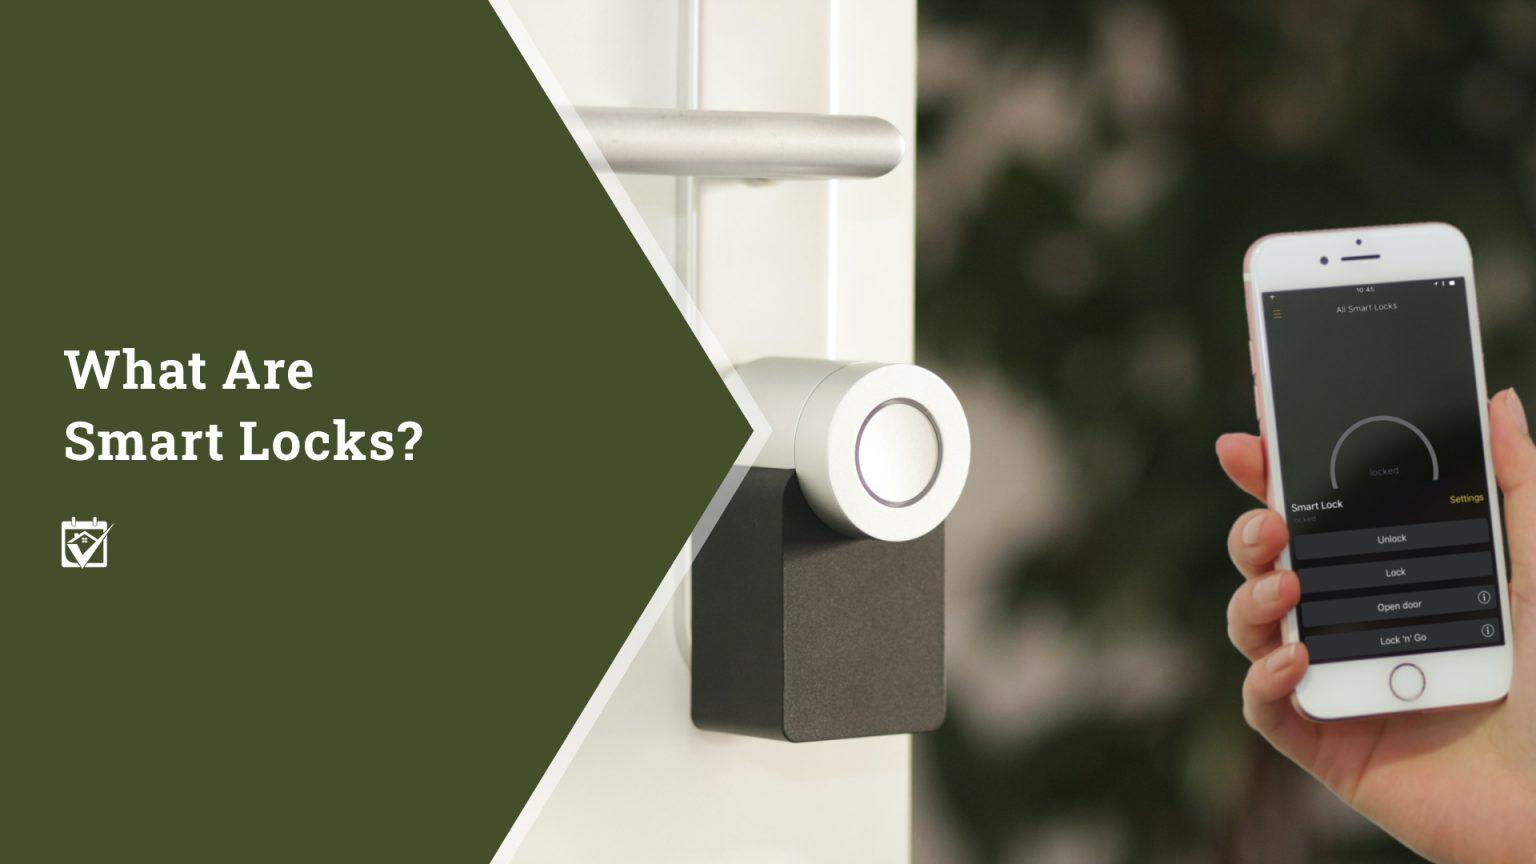 What are Smart Locks